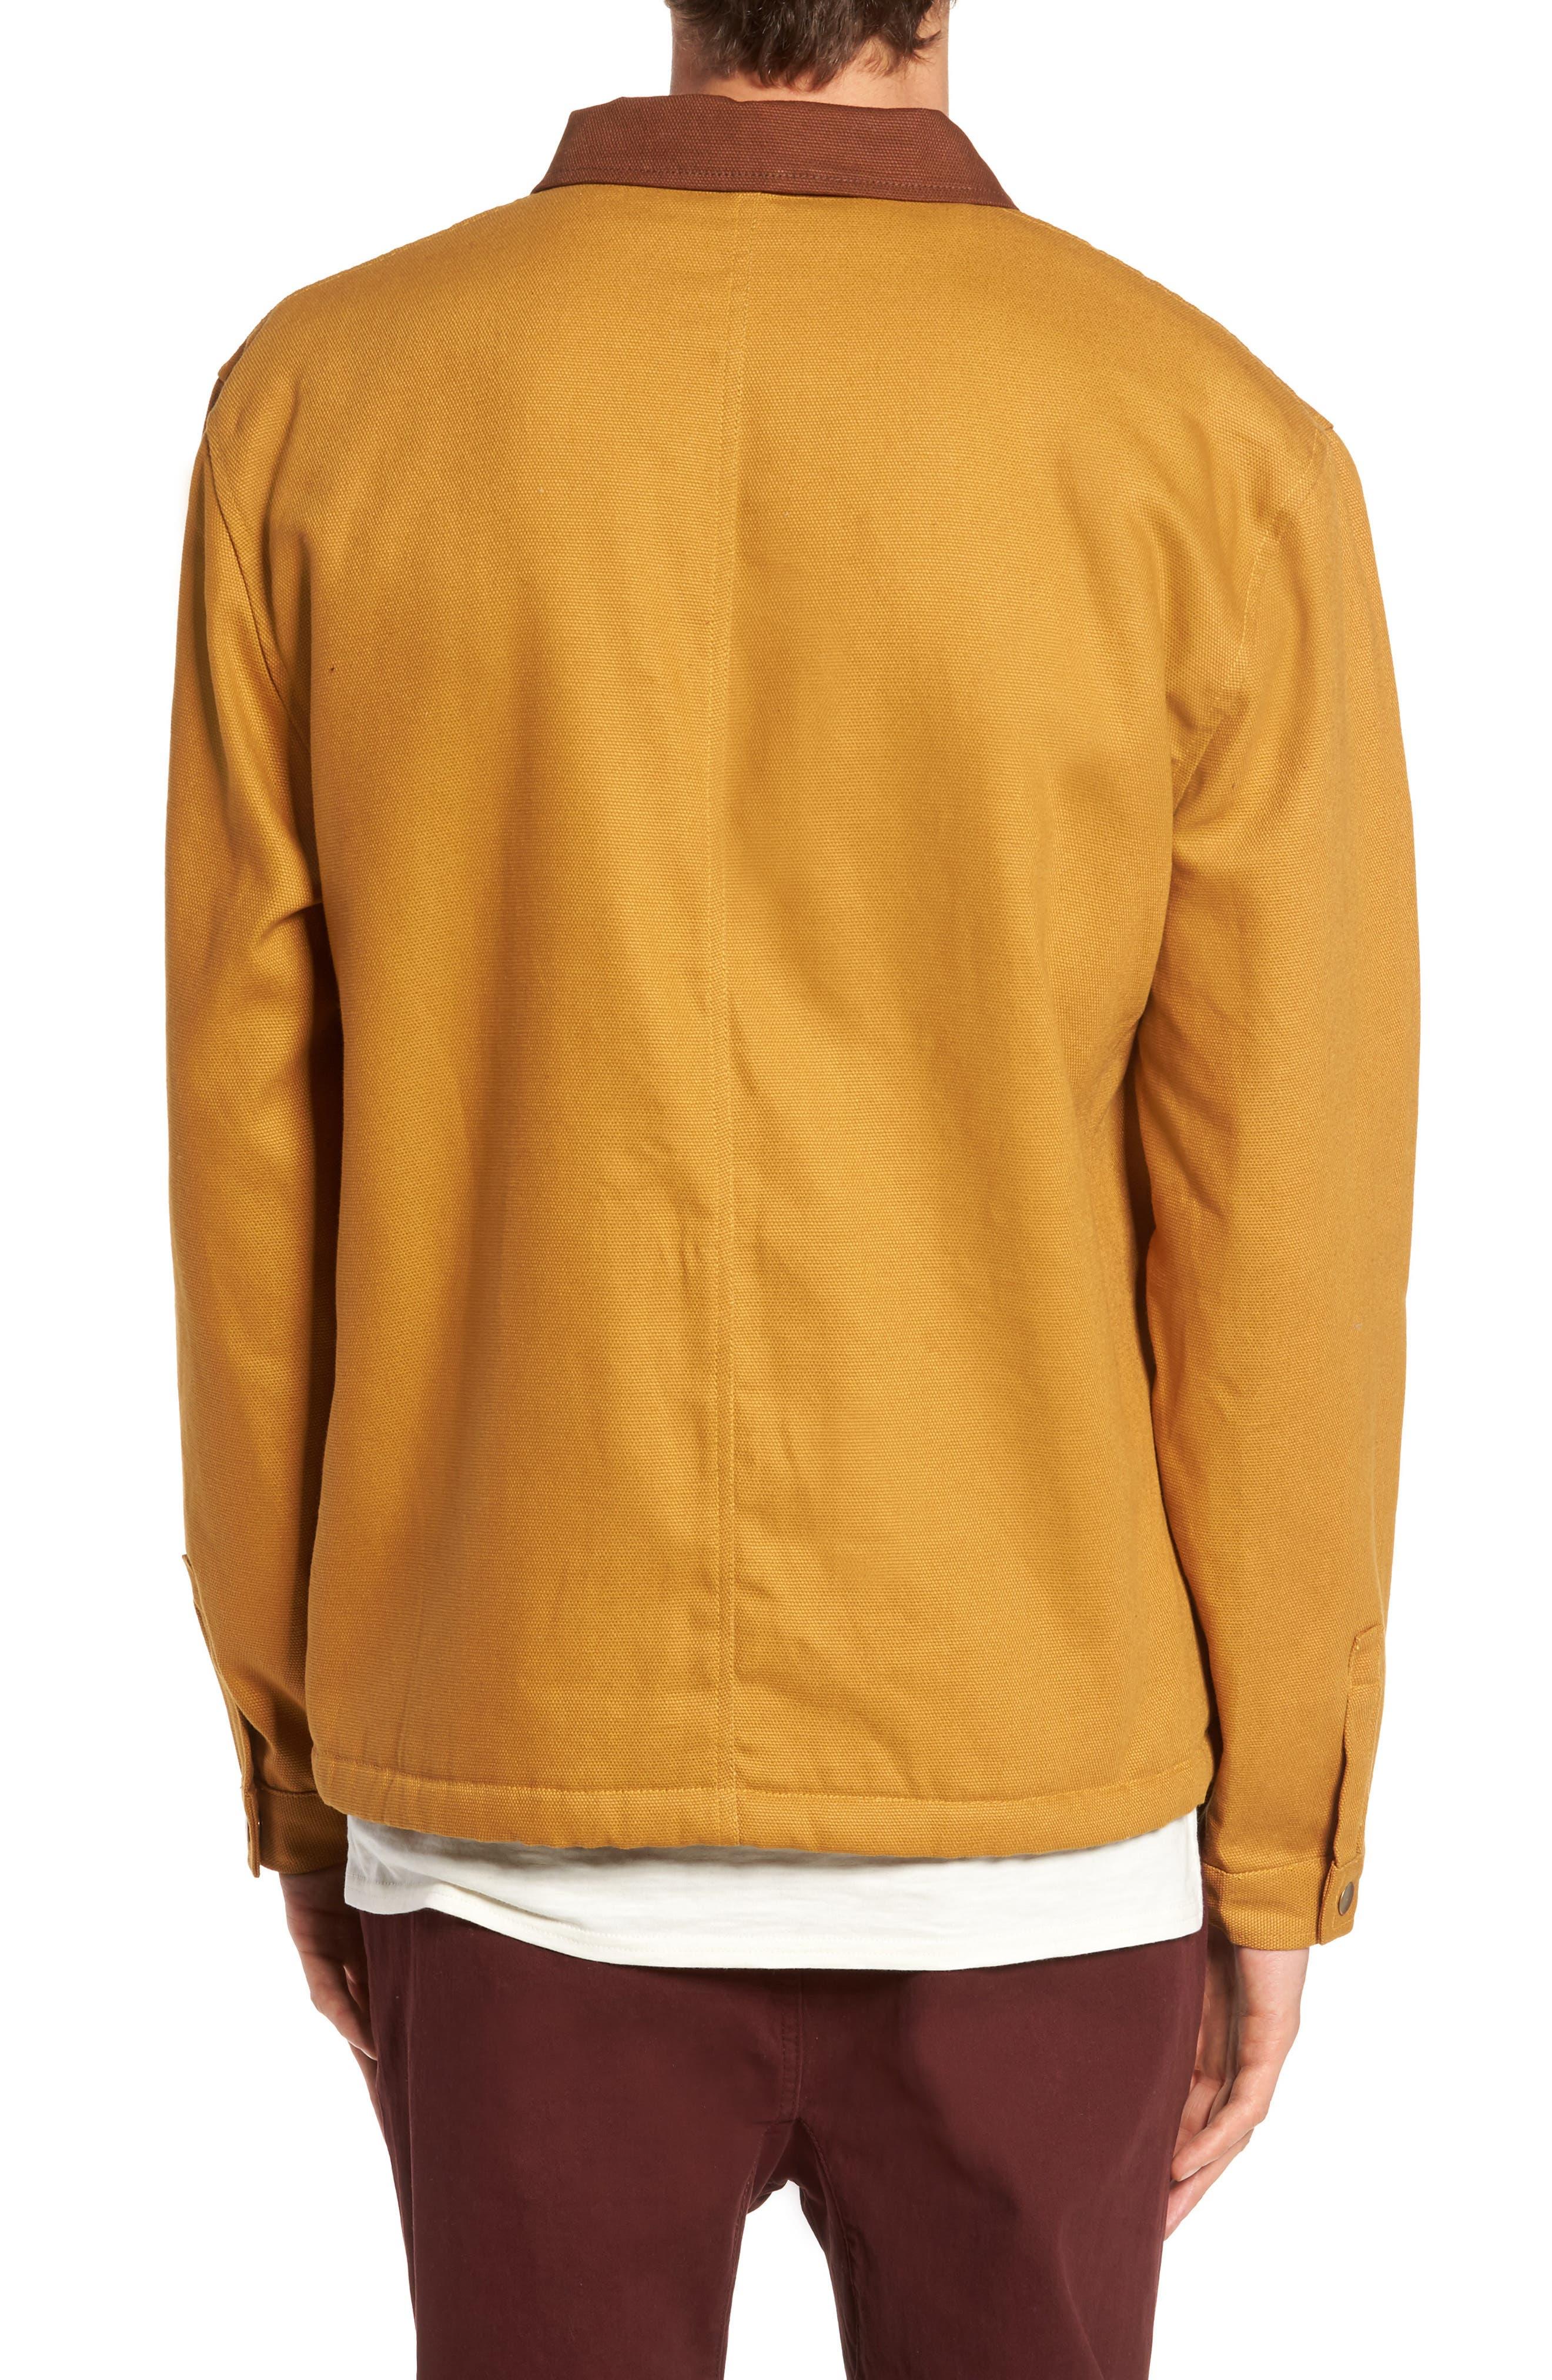 Chandler Jacket,                             Alternate thumbnail 2, color,                             Khaki